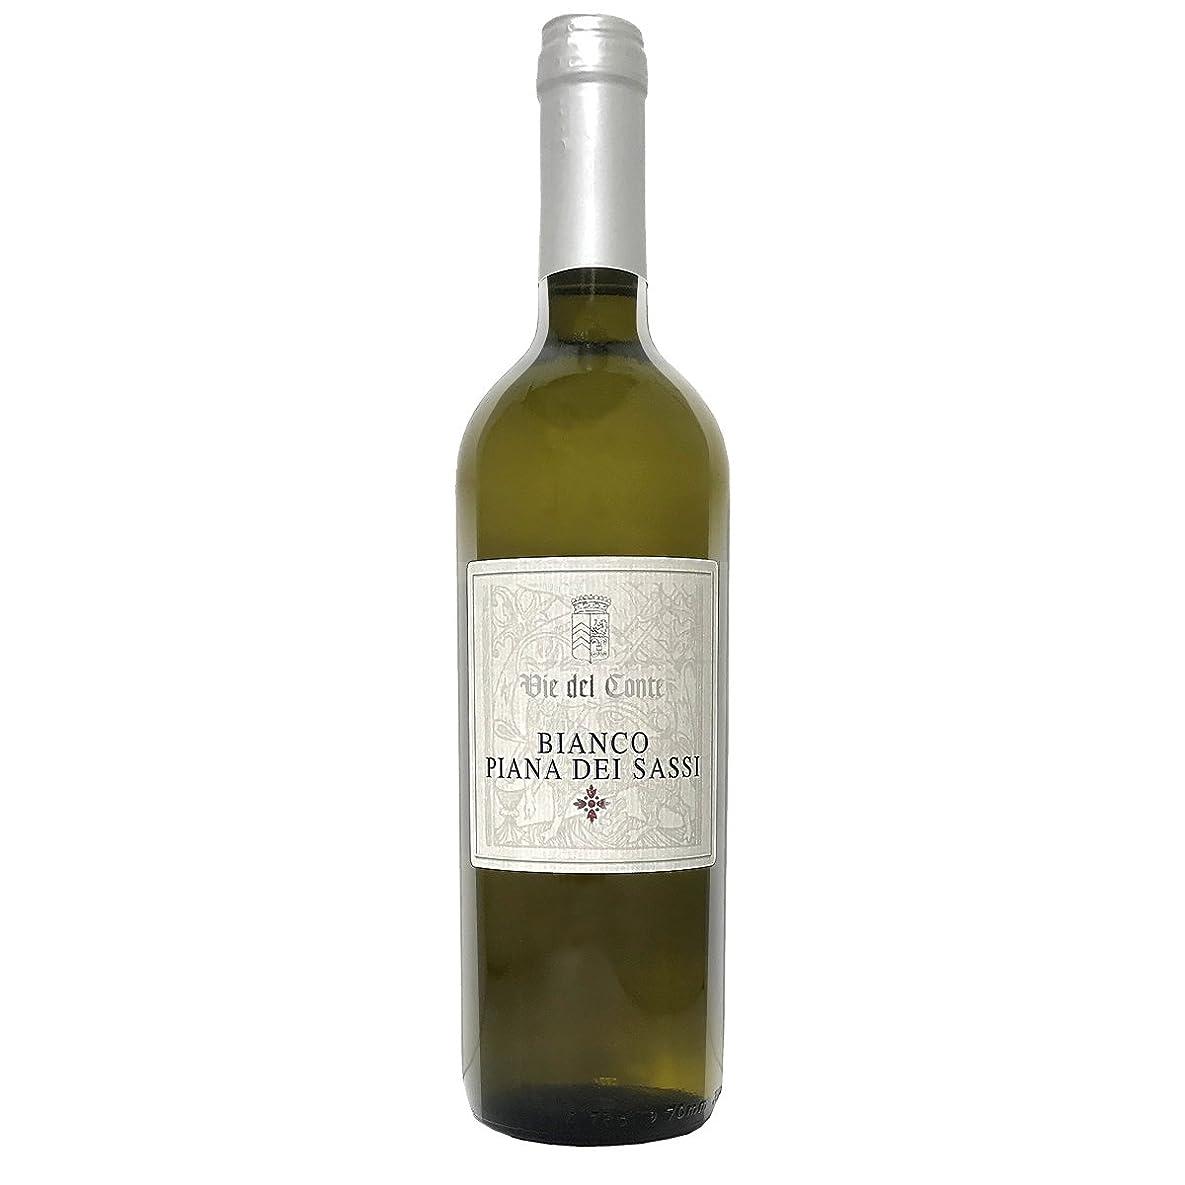 Lazos イタリアワイン ピアーナ デイ サッシ ビアンコ NV